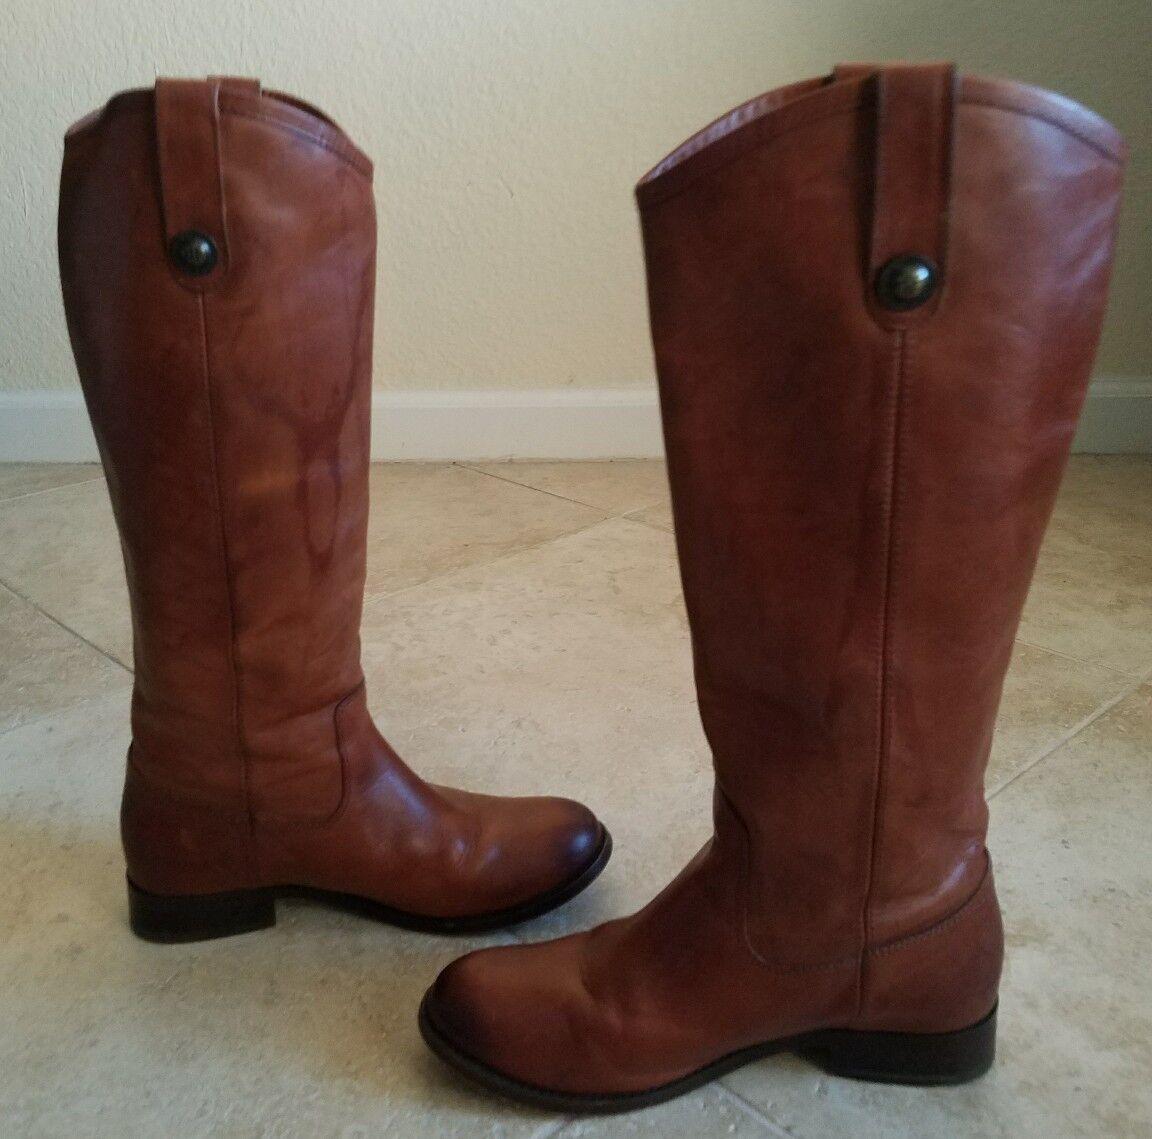 FRYE 'Melissa Button' Cognac Leather Calf Riding Boots Size, 6 B